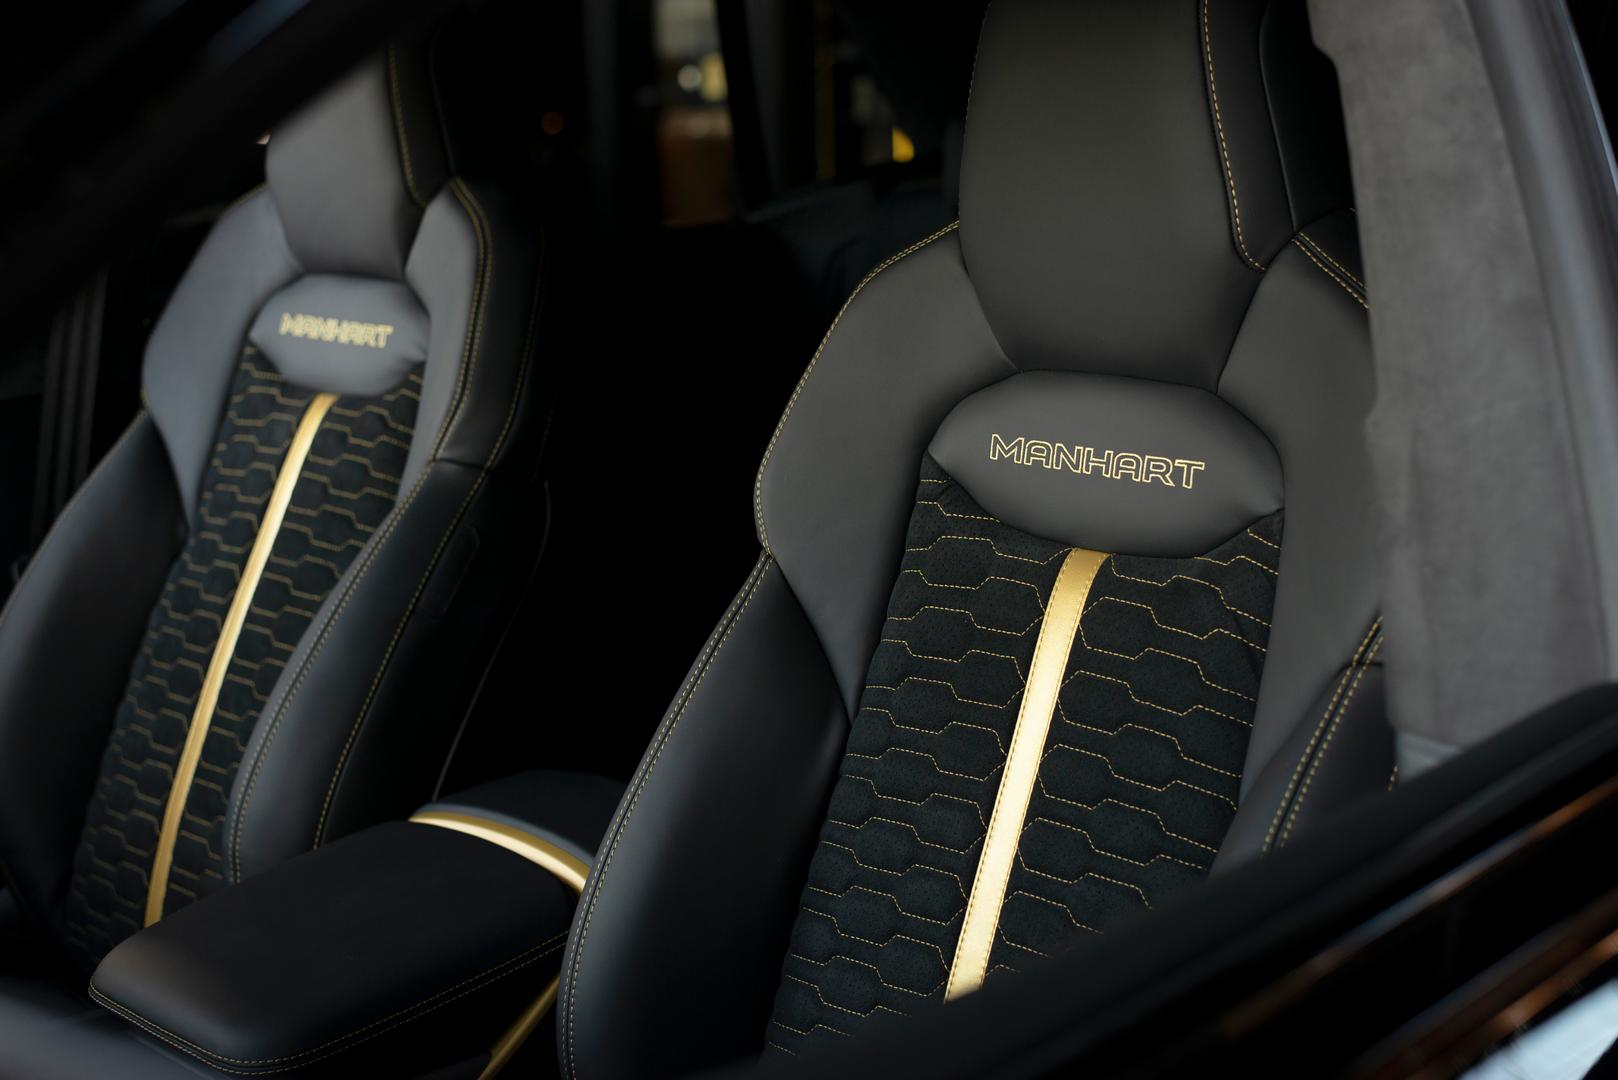 Manhart Audi RS Q8 seats